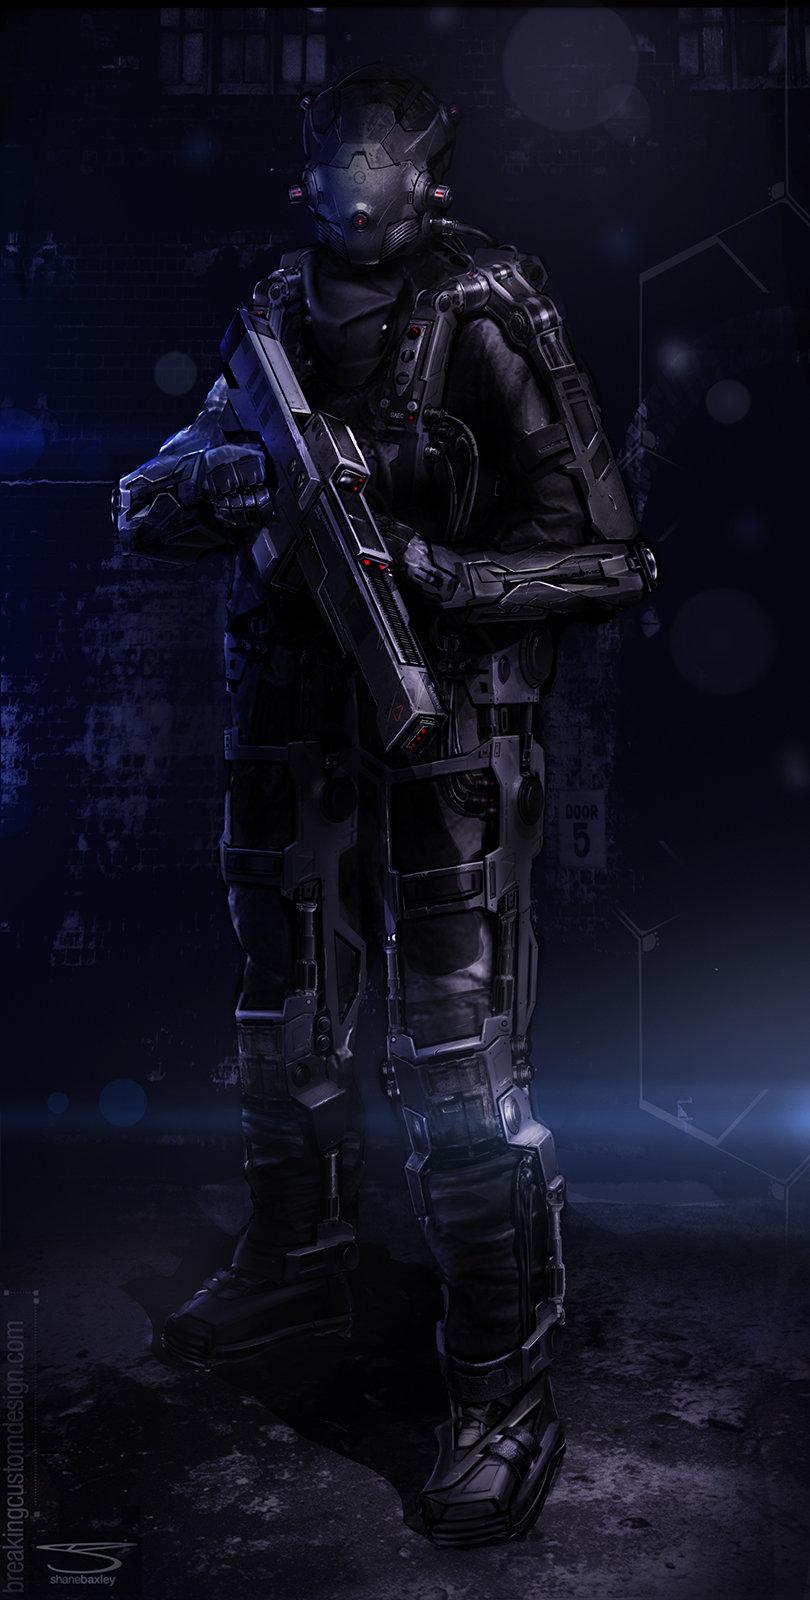 Shane baxley soldier 33 lorezzed edit 5